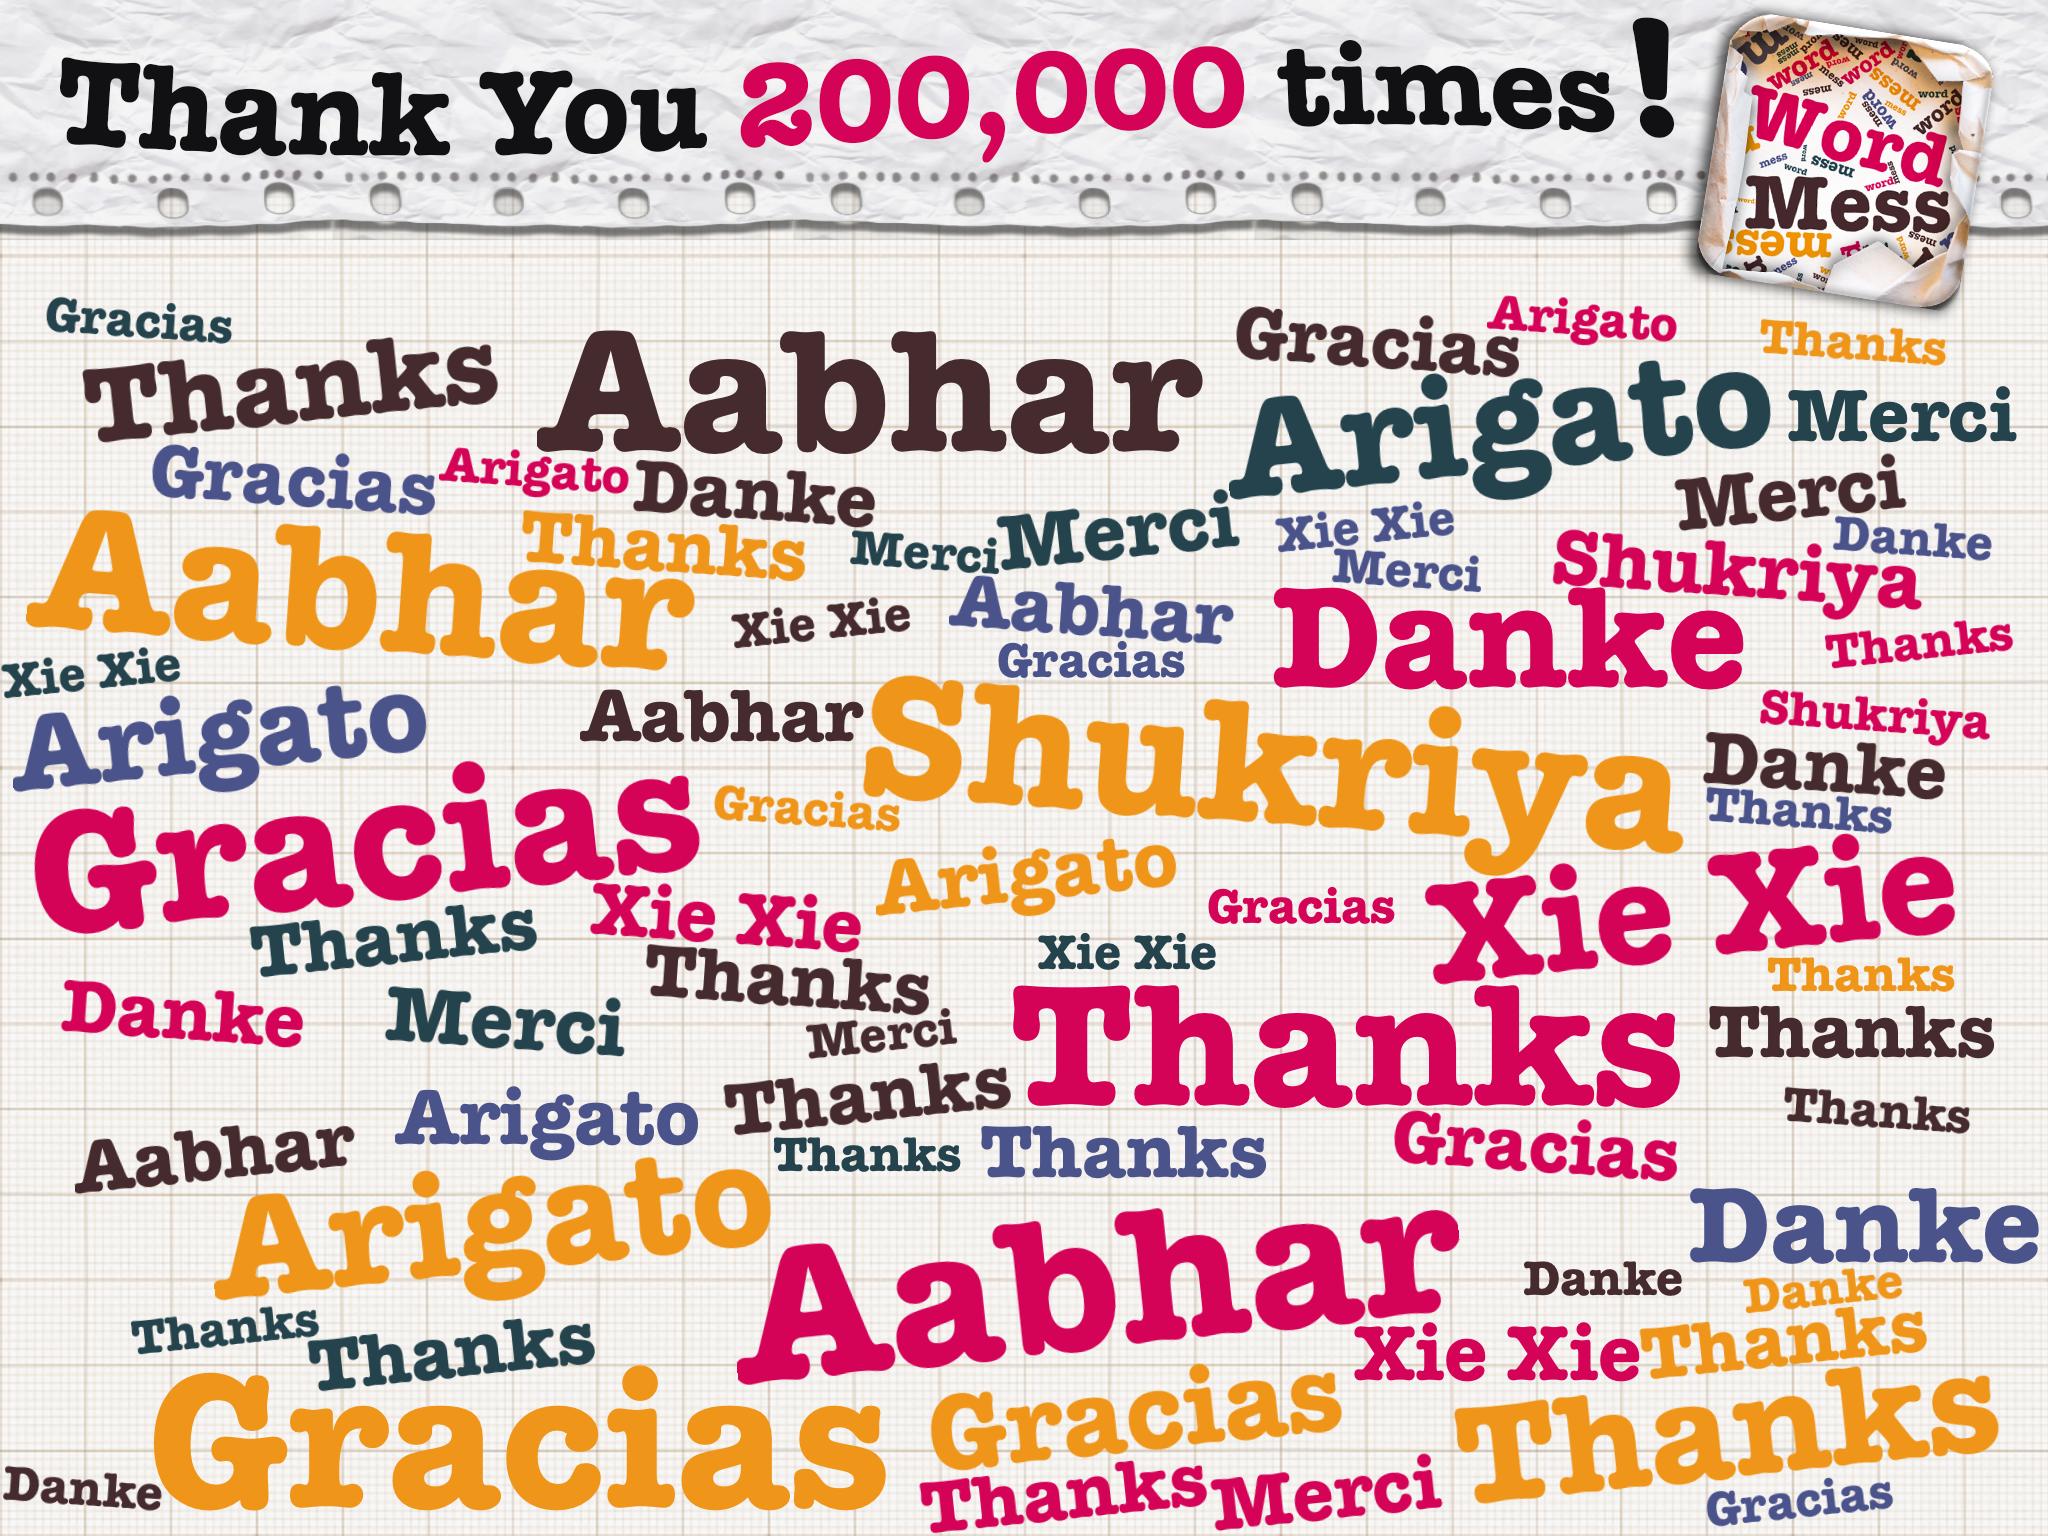 Word Mess crosses 200,000 downloads!